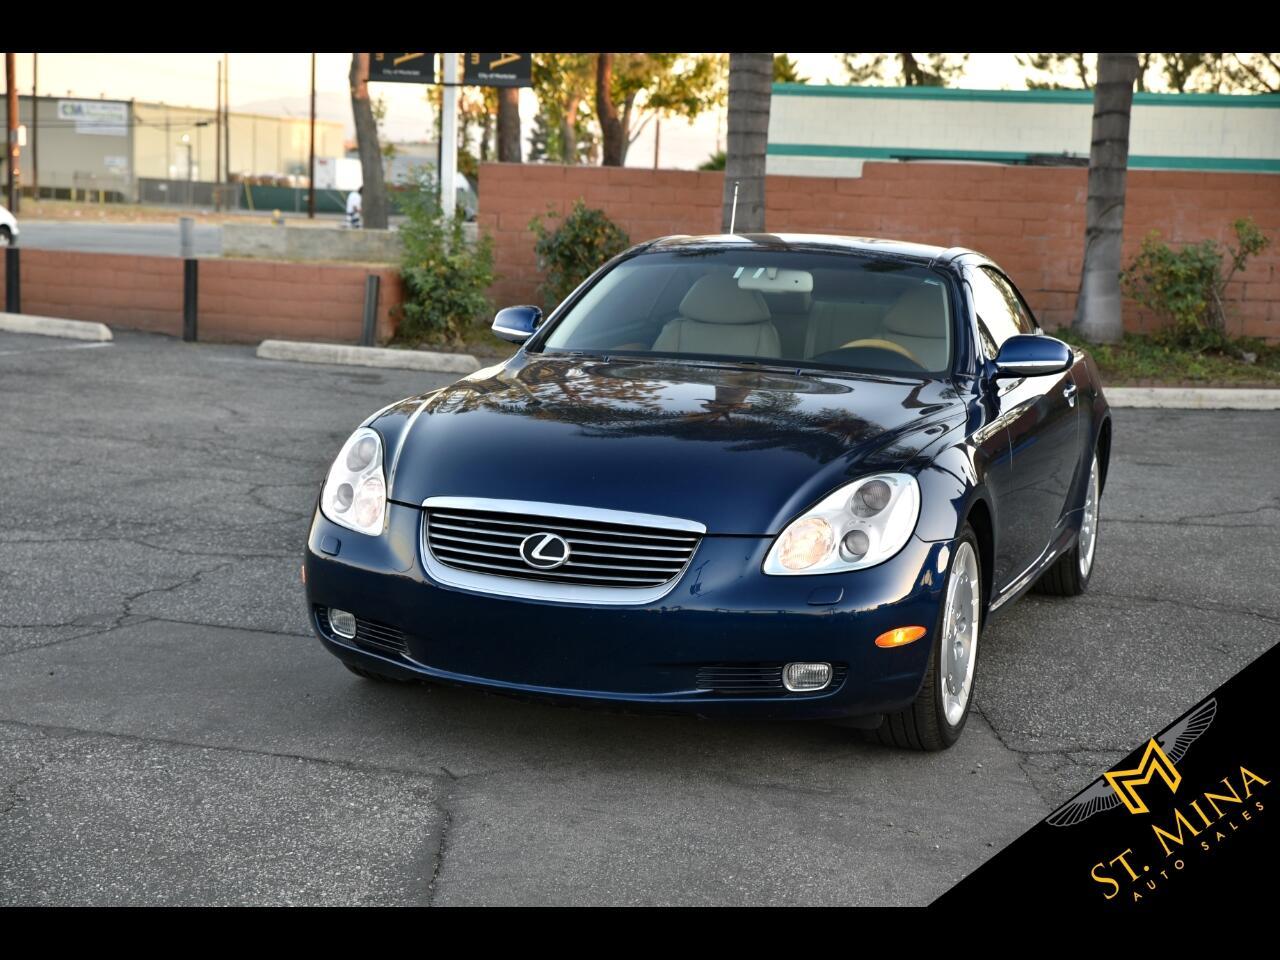 2004 Lexus SC 430 Convertible